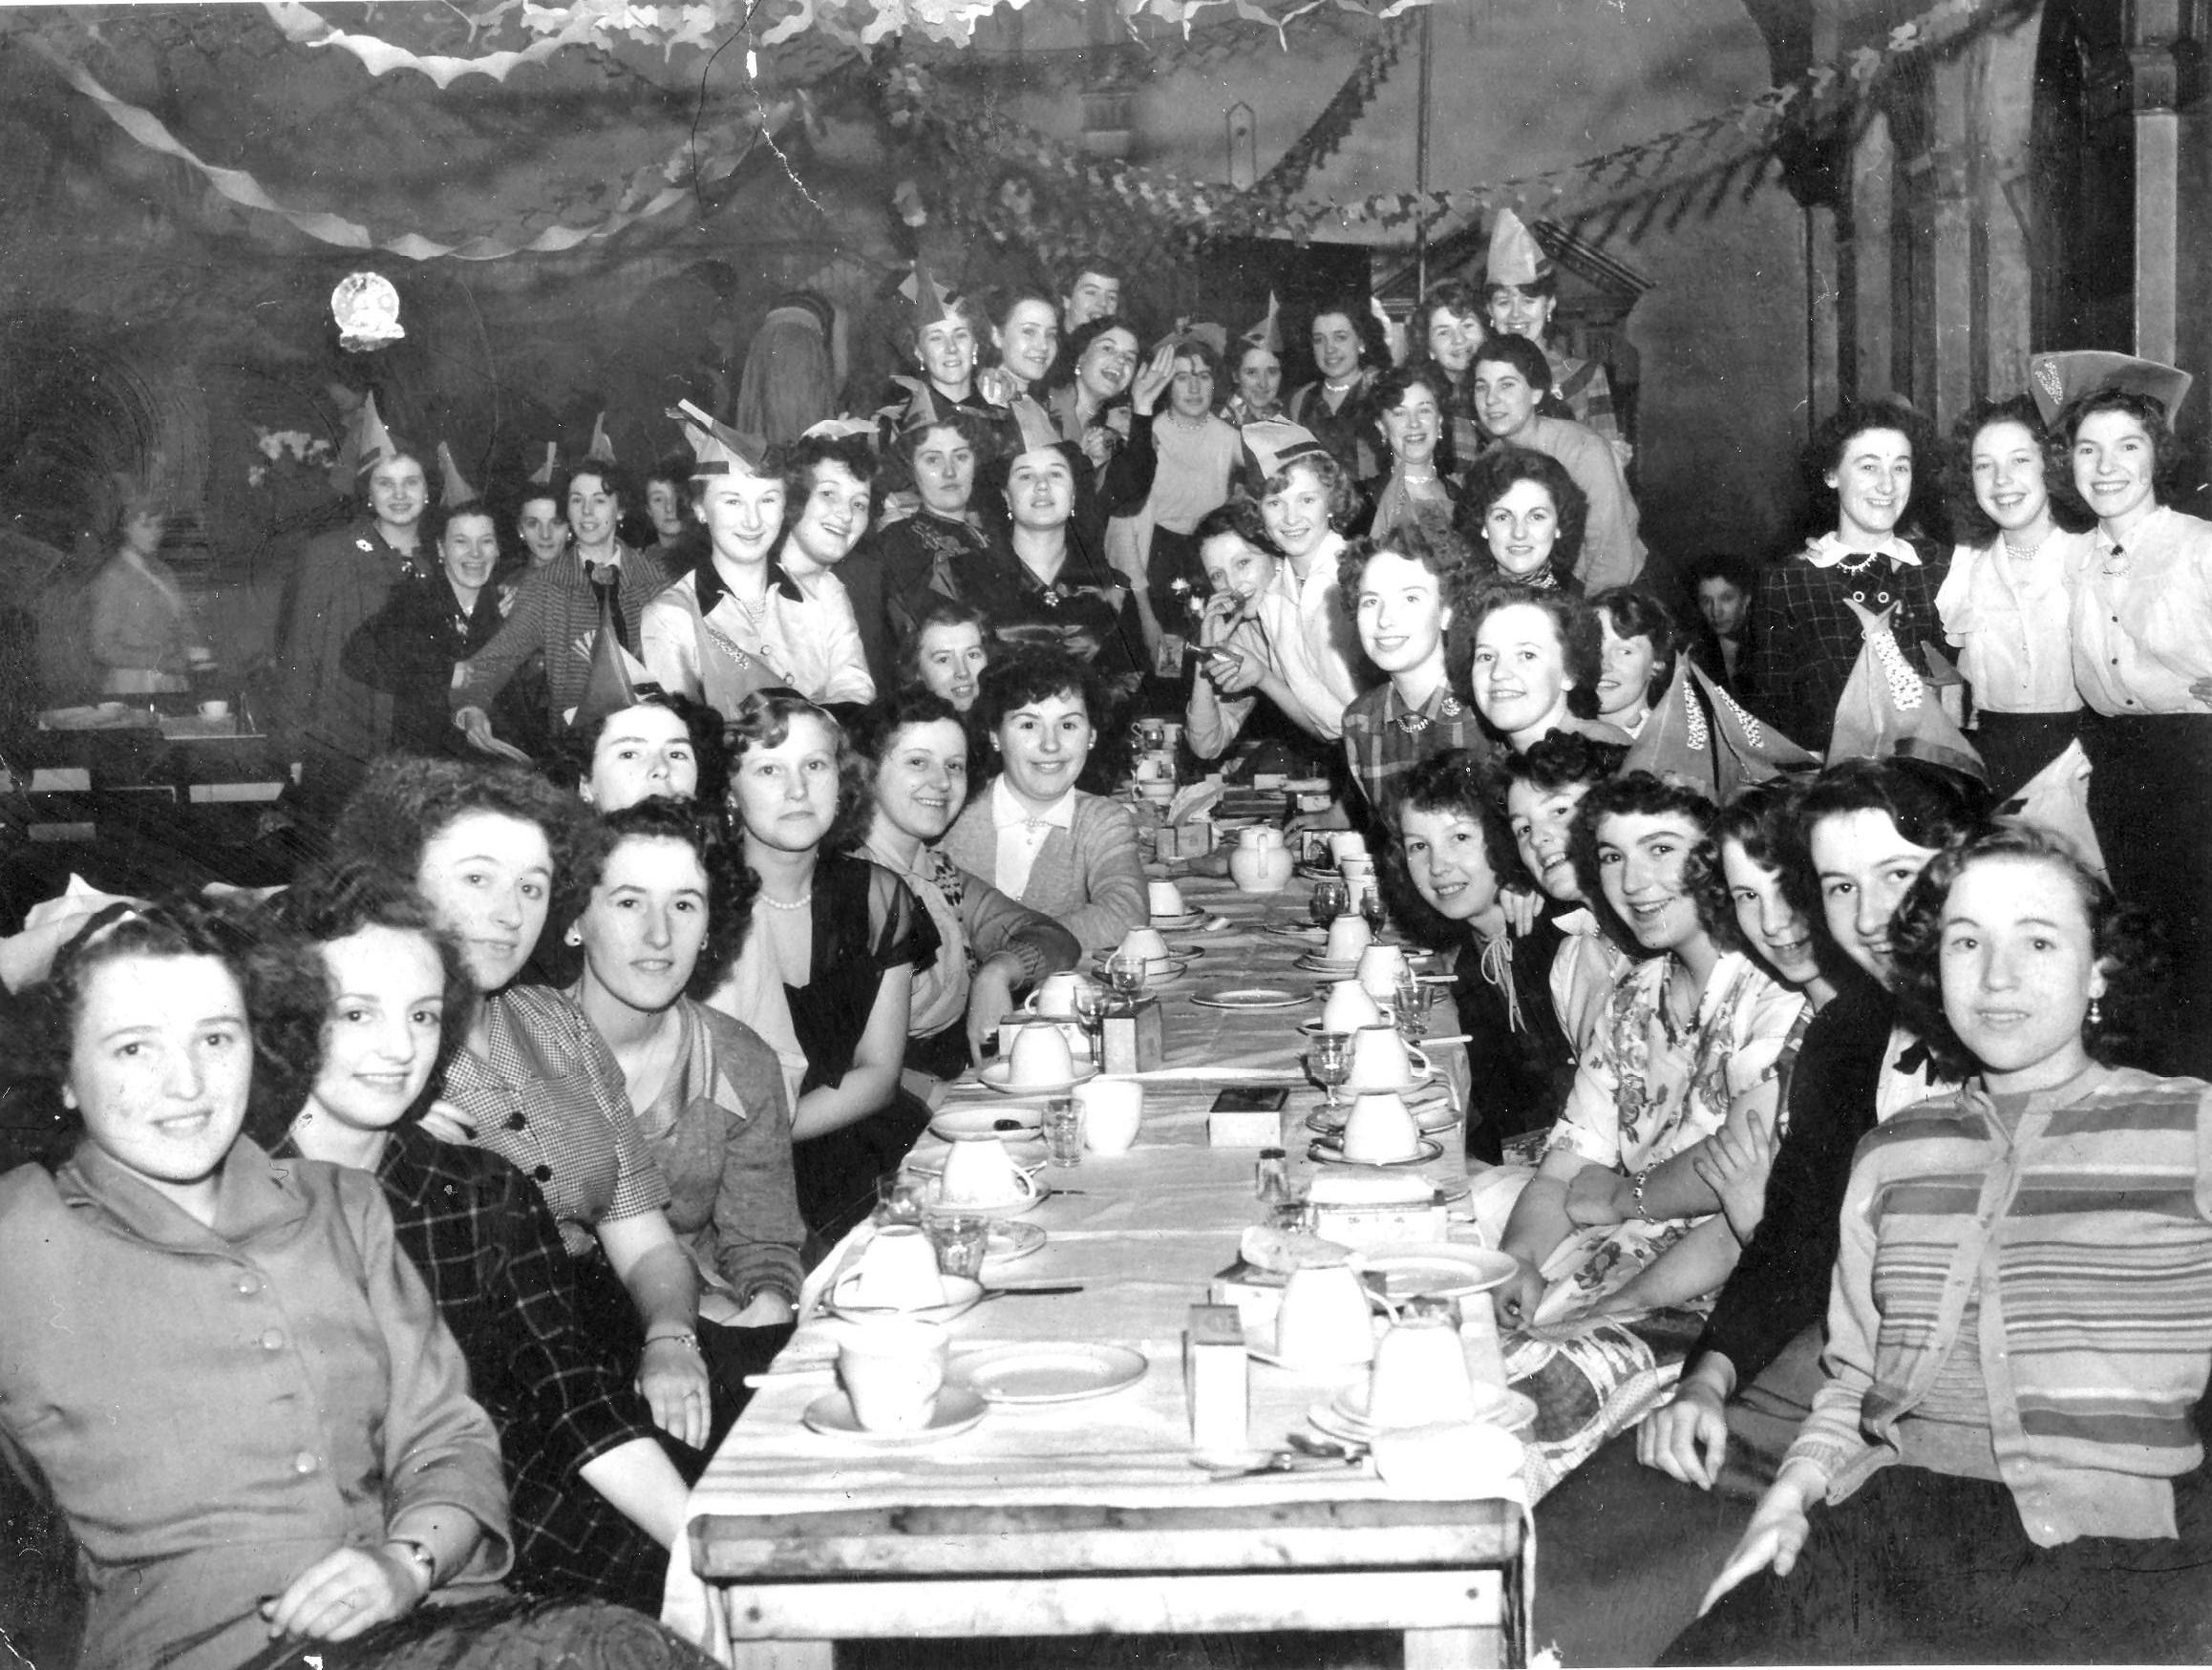 More 1950s fun at South Moor-Moor 1950's